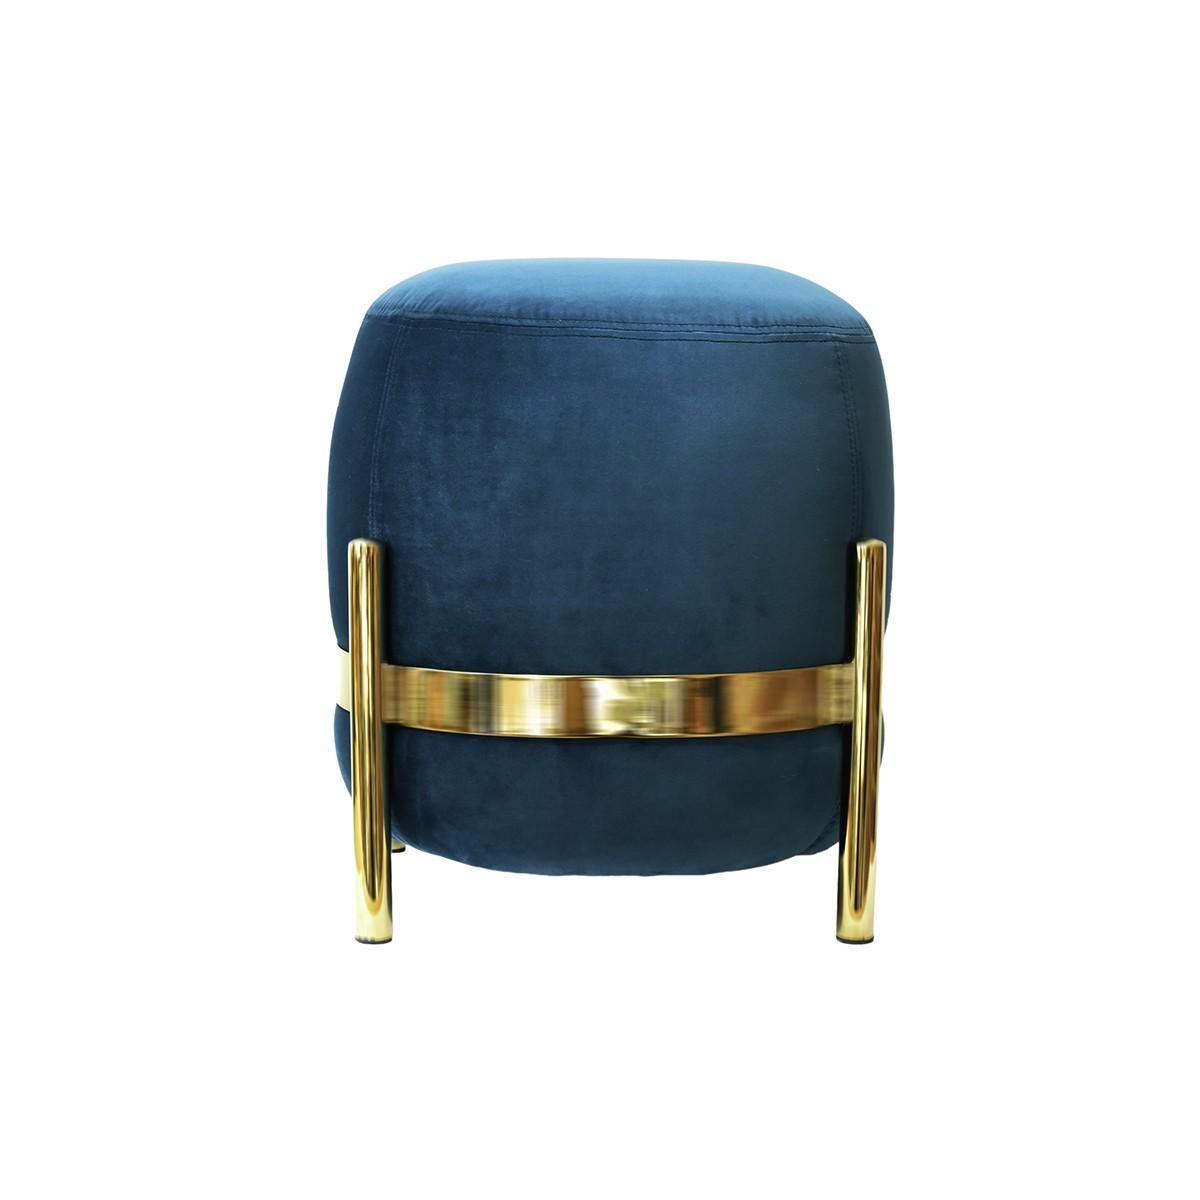 pouf vega de enostudio bleu canard et acier laitonn. Black Bedroom Furniture Sets. Home Design Ideas